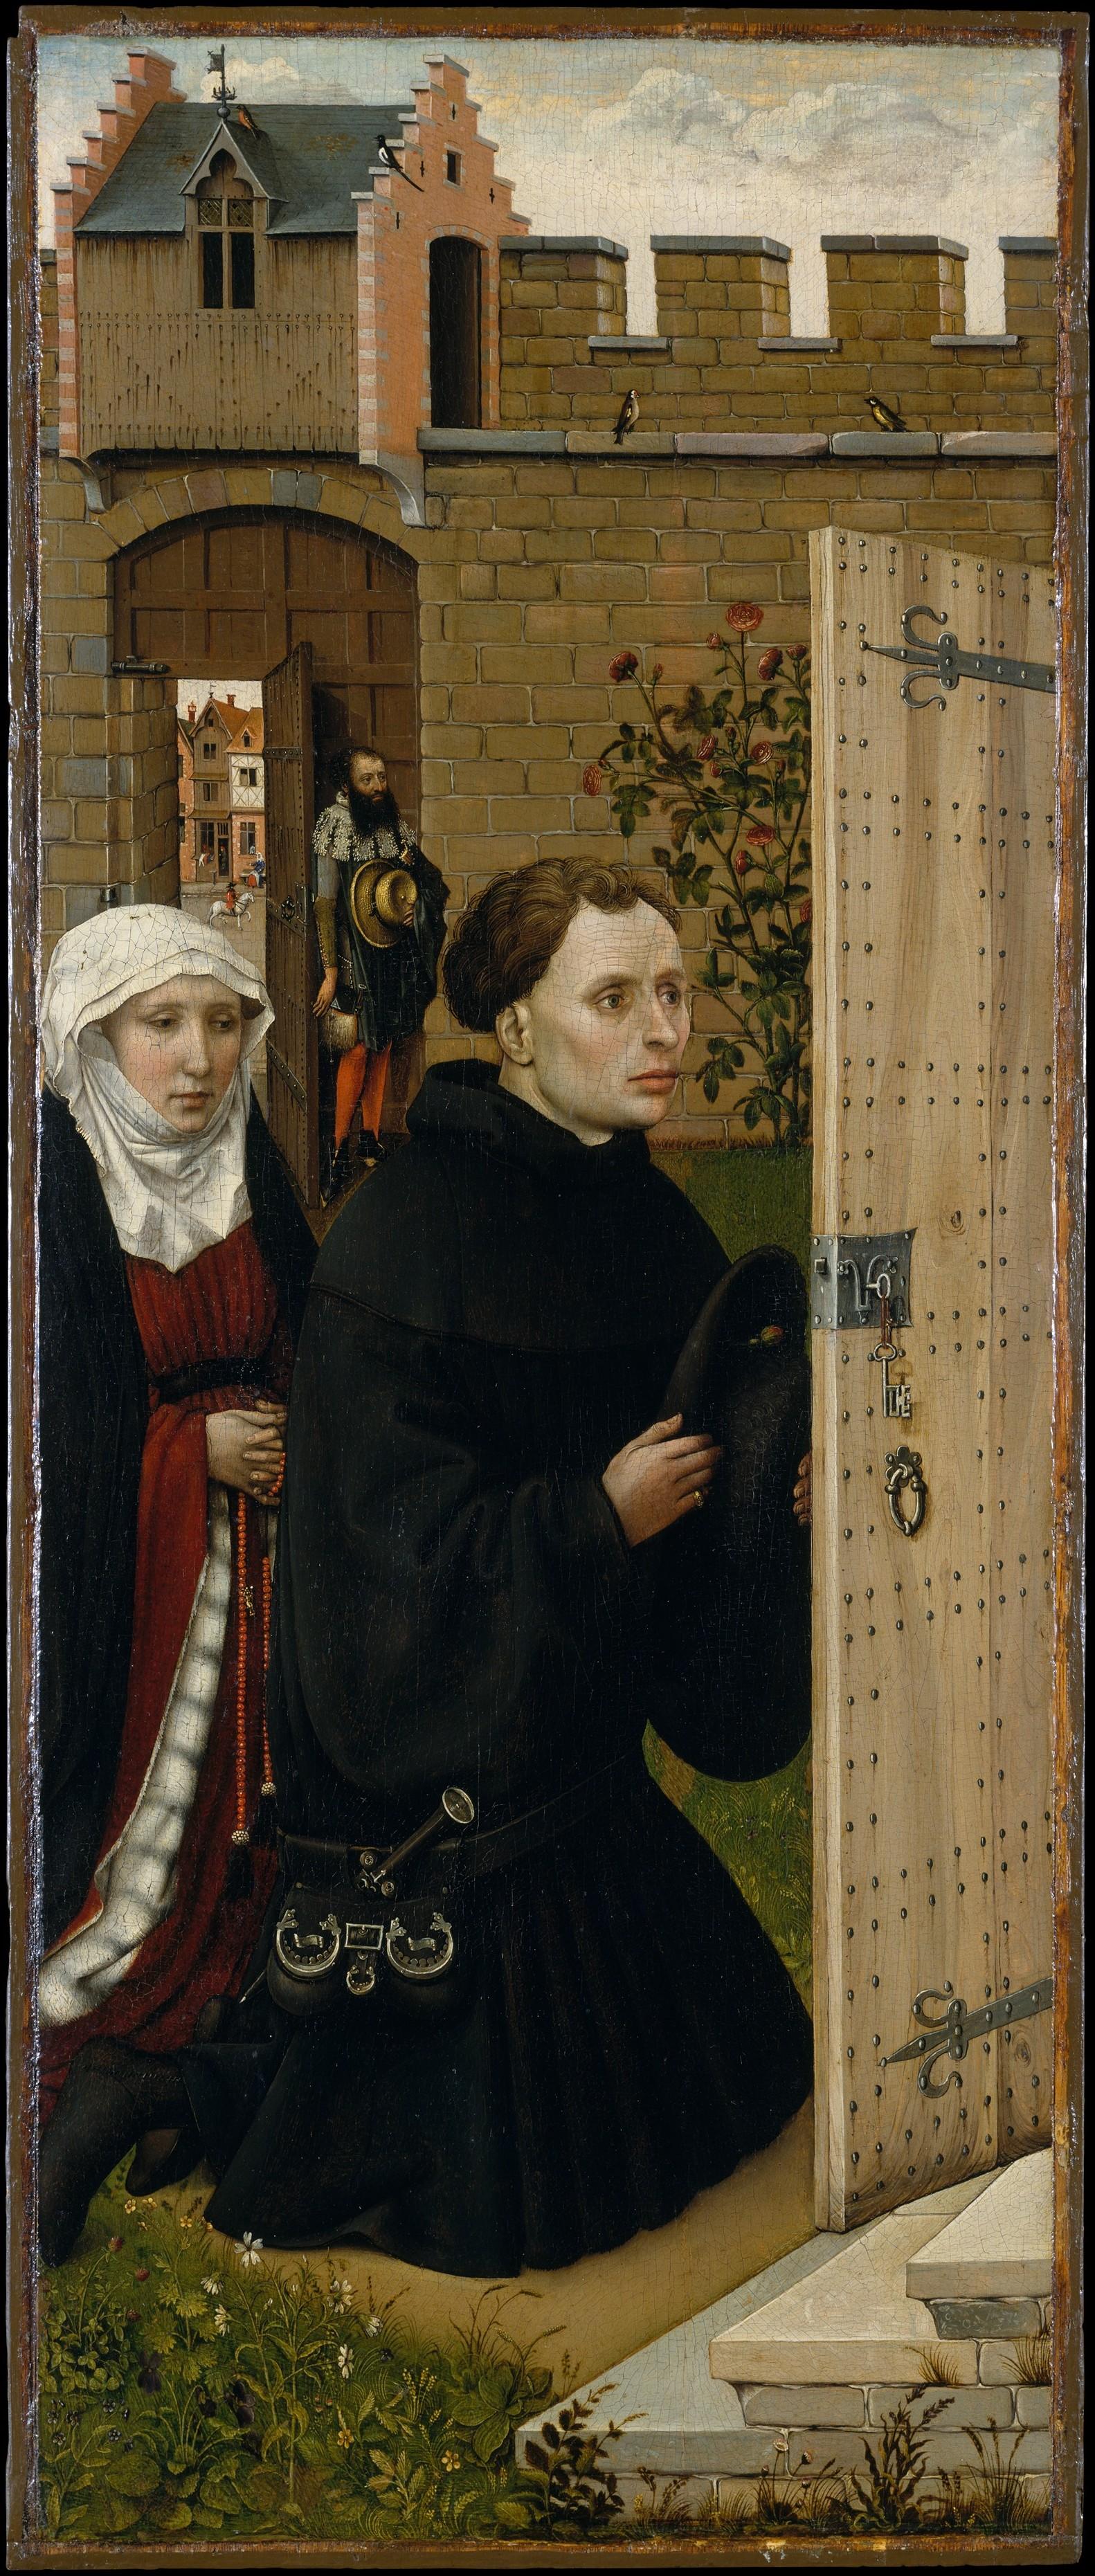 https://upload.wikimedia.org/wikipedia/commons/9/95/Annunciation_Triptych_%28Merode_Altarpiece%29_MET_DT7256.jpg